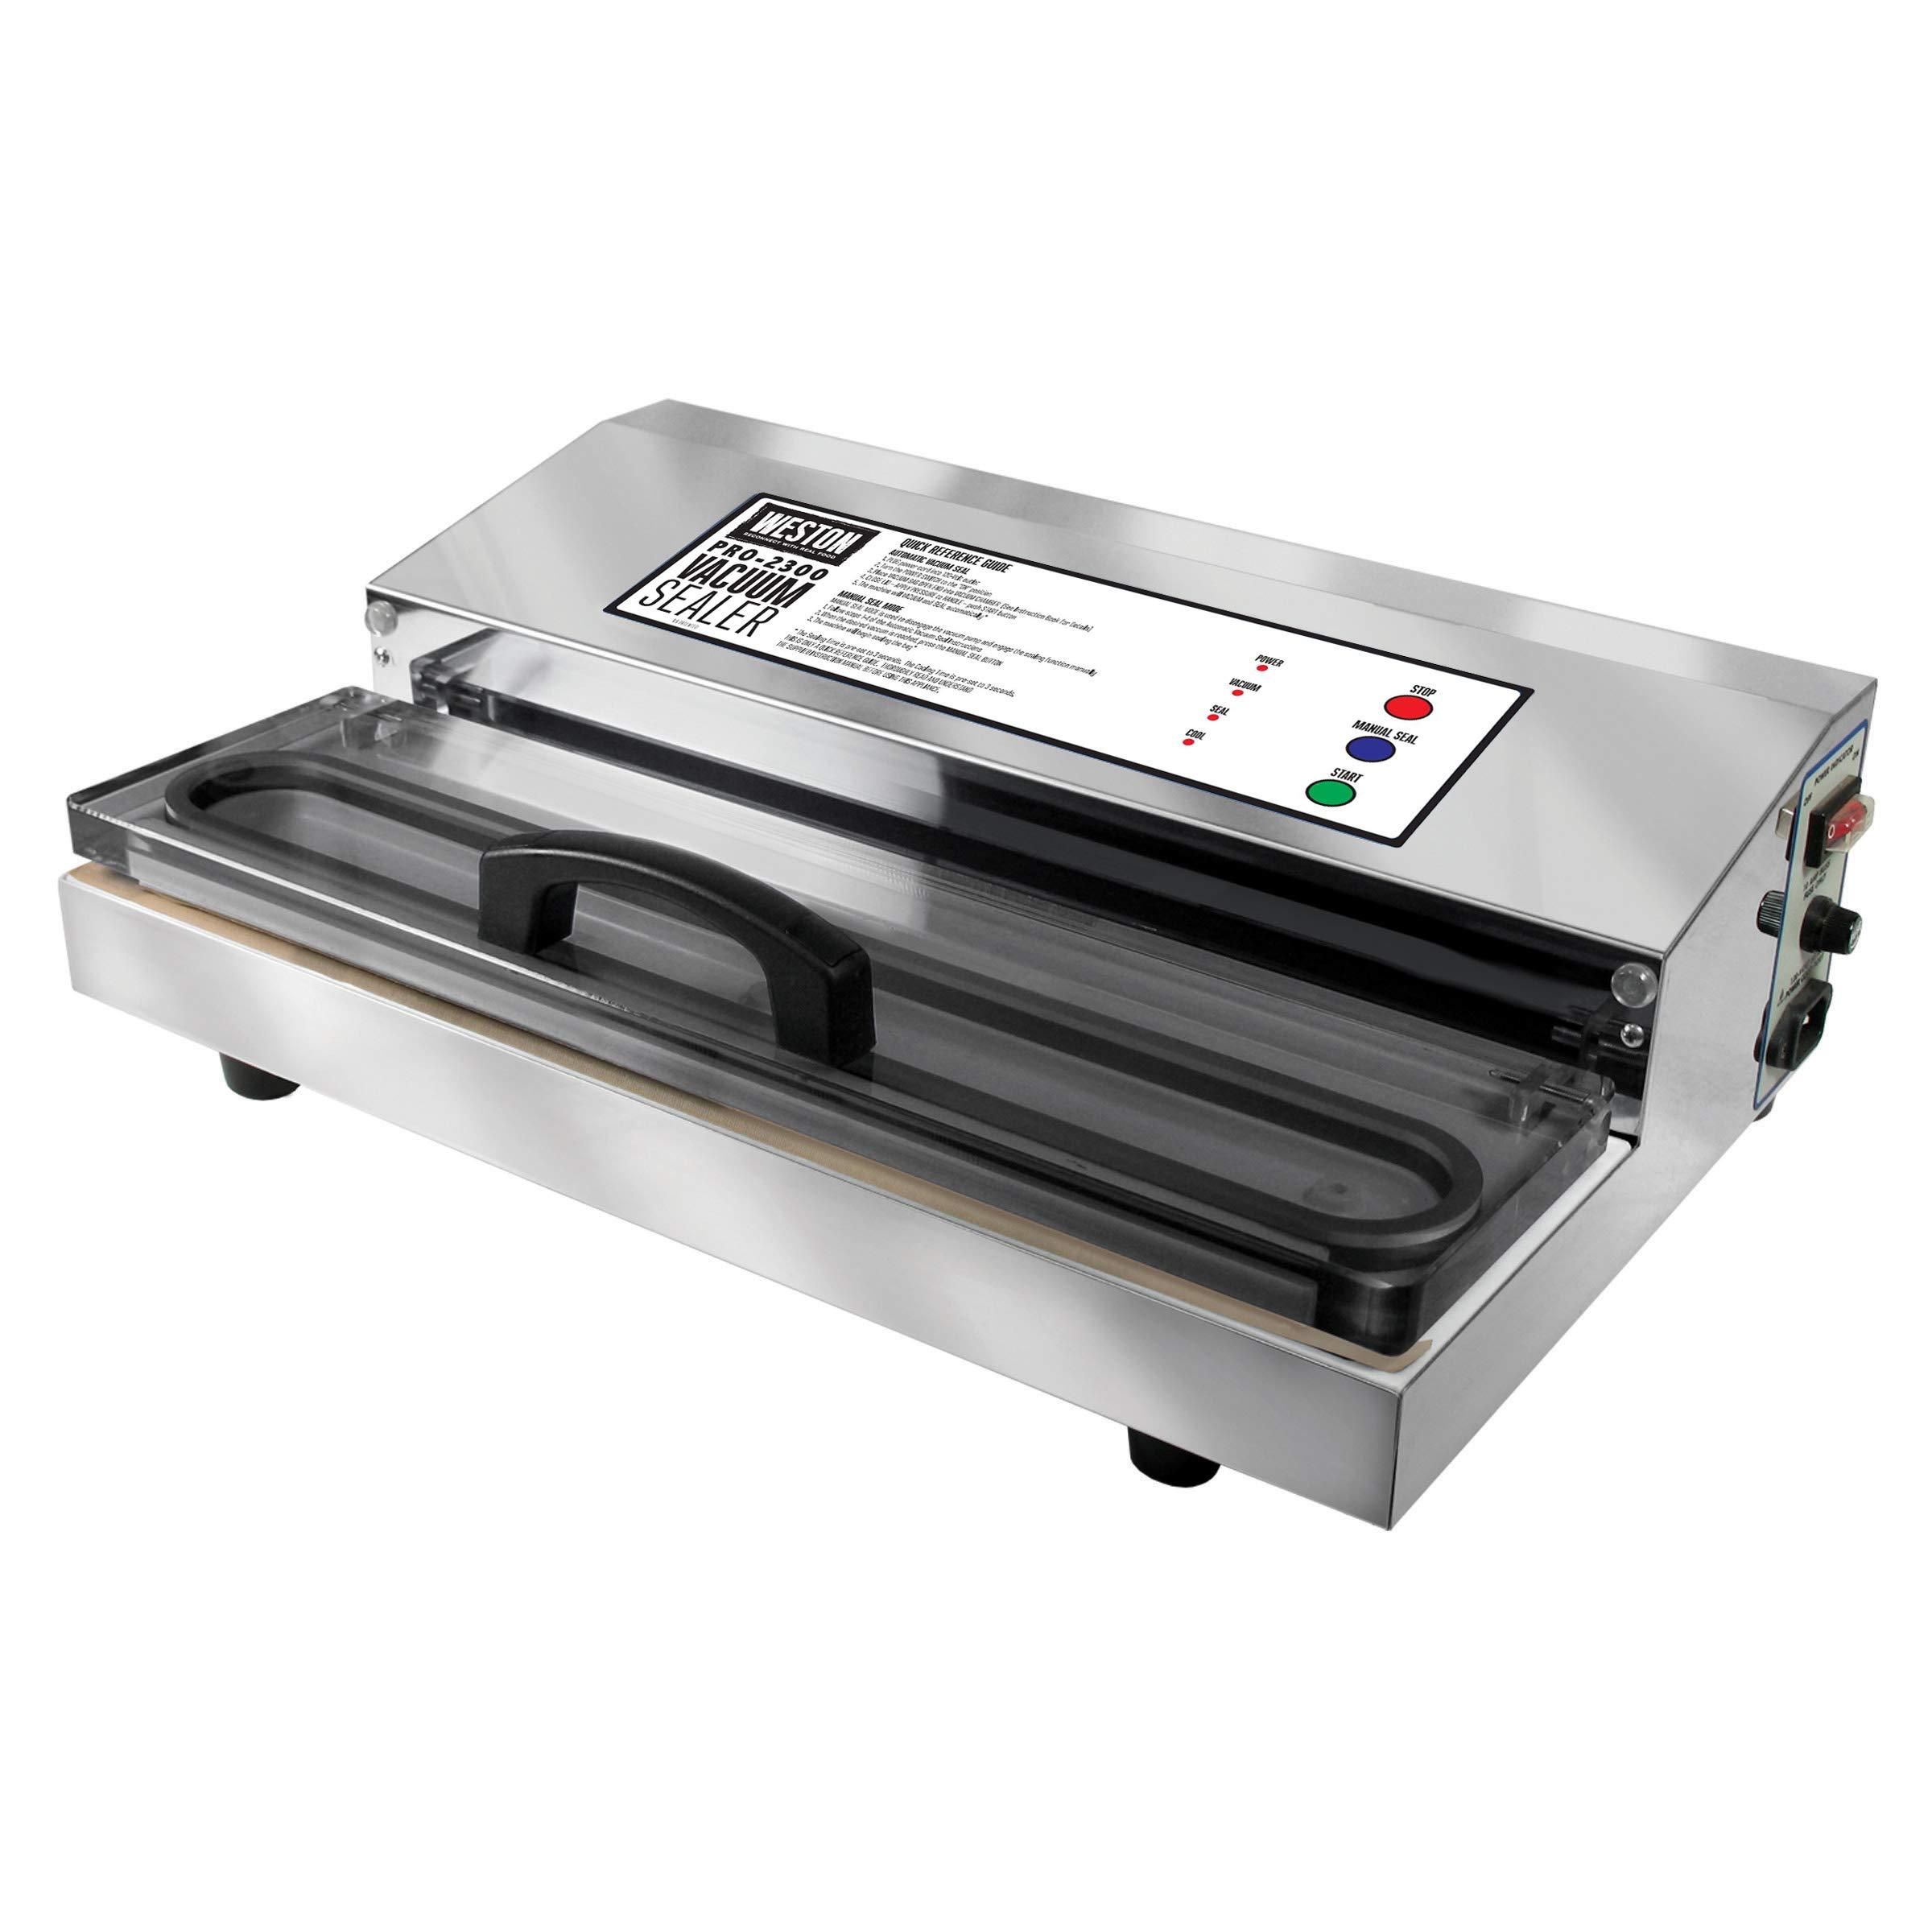 Nesco Vs 12 Vacuum Sealer Vs Weston Pro 2300 Vacuum Sealer Slant